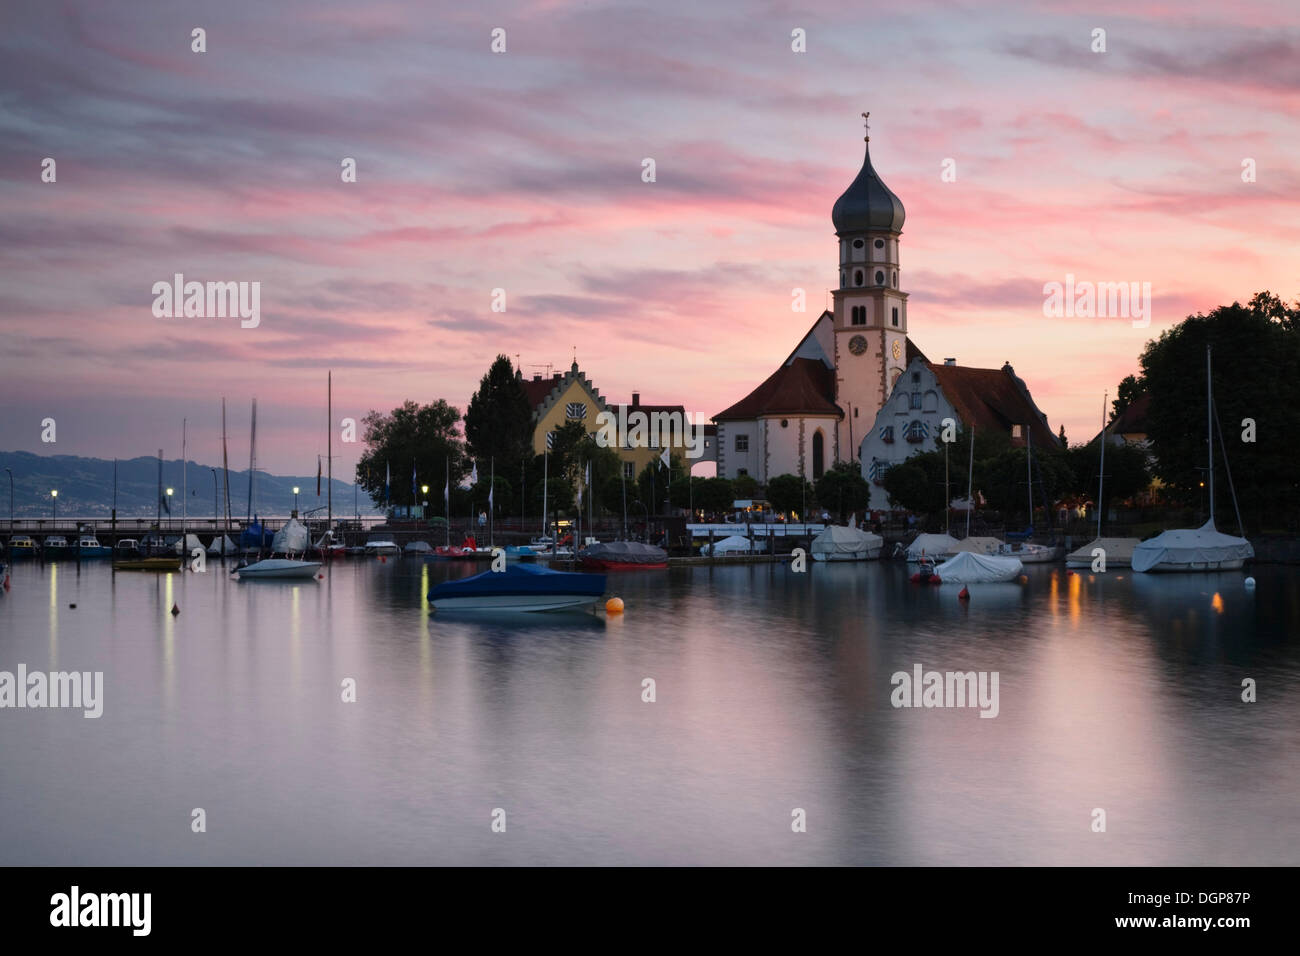 Church of St. George at sunset, Wasserburg, Lake Constance, Bavaria - Stock Image